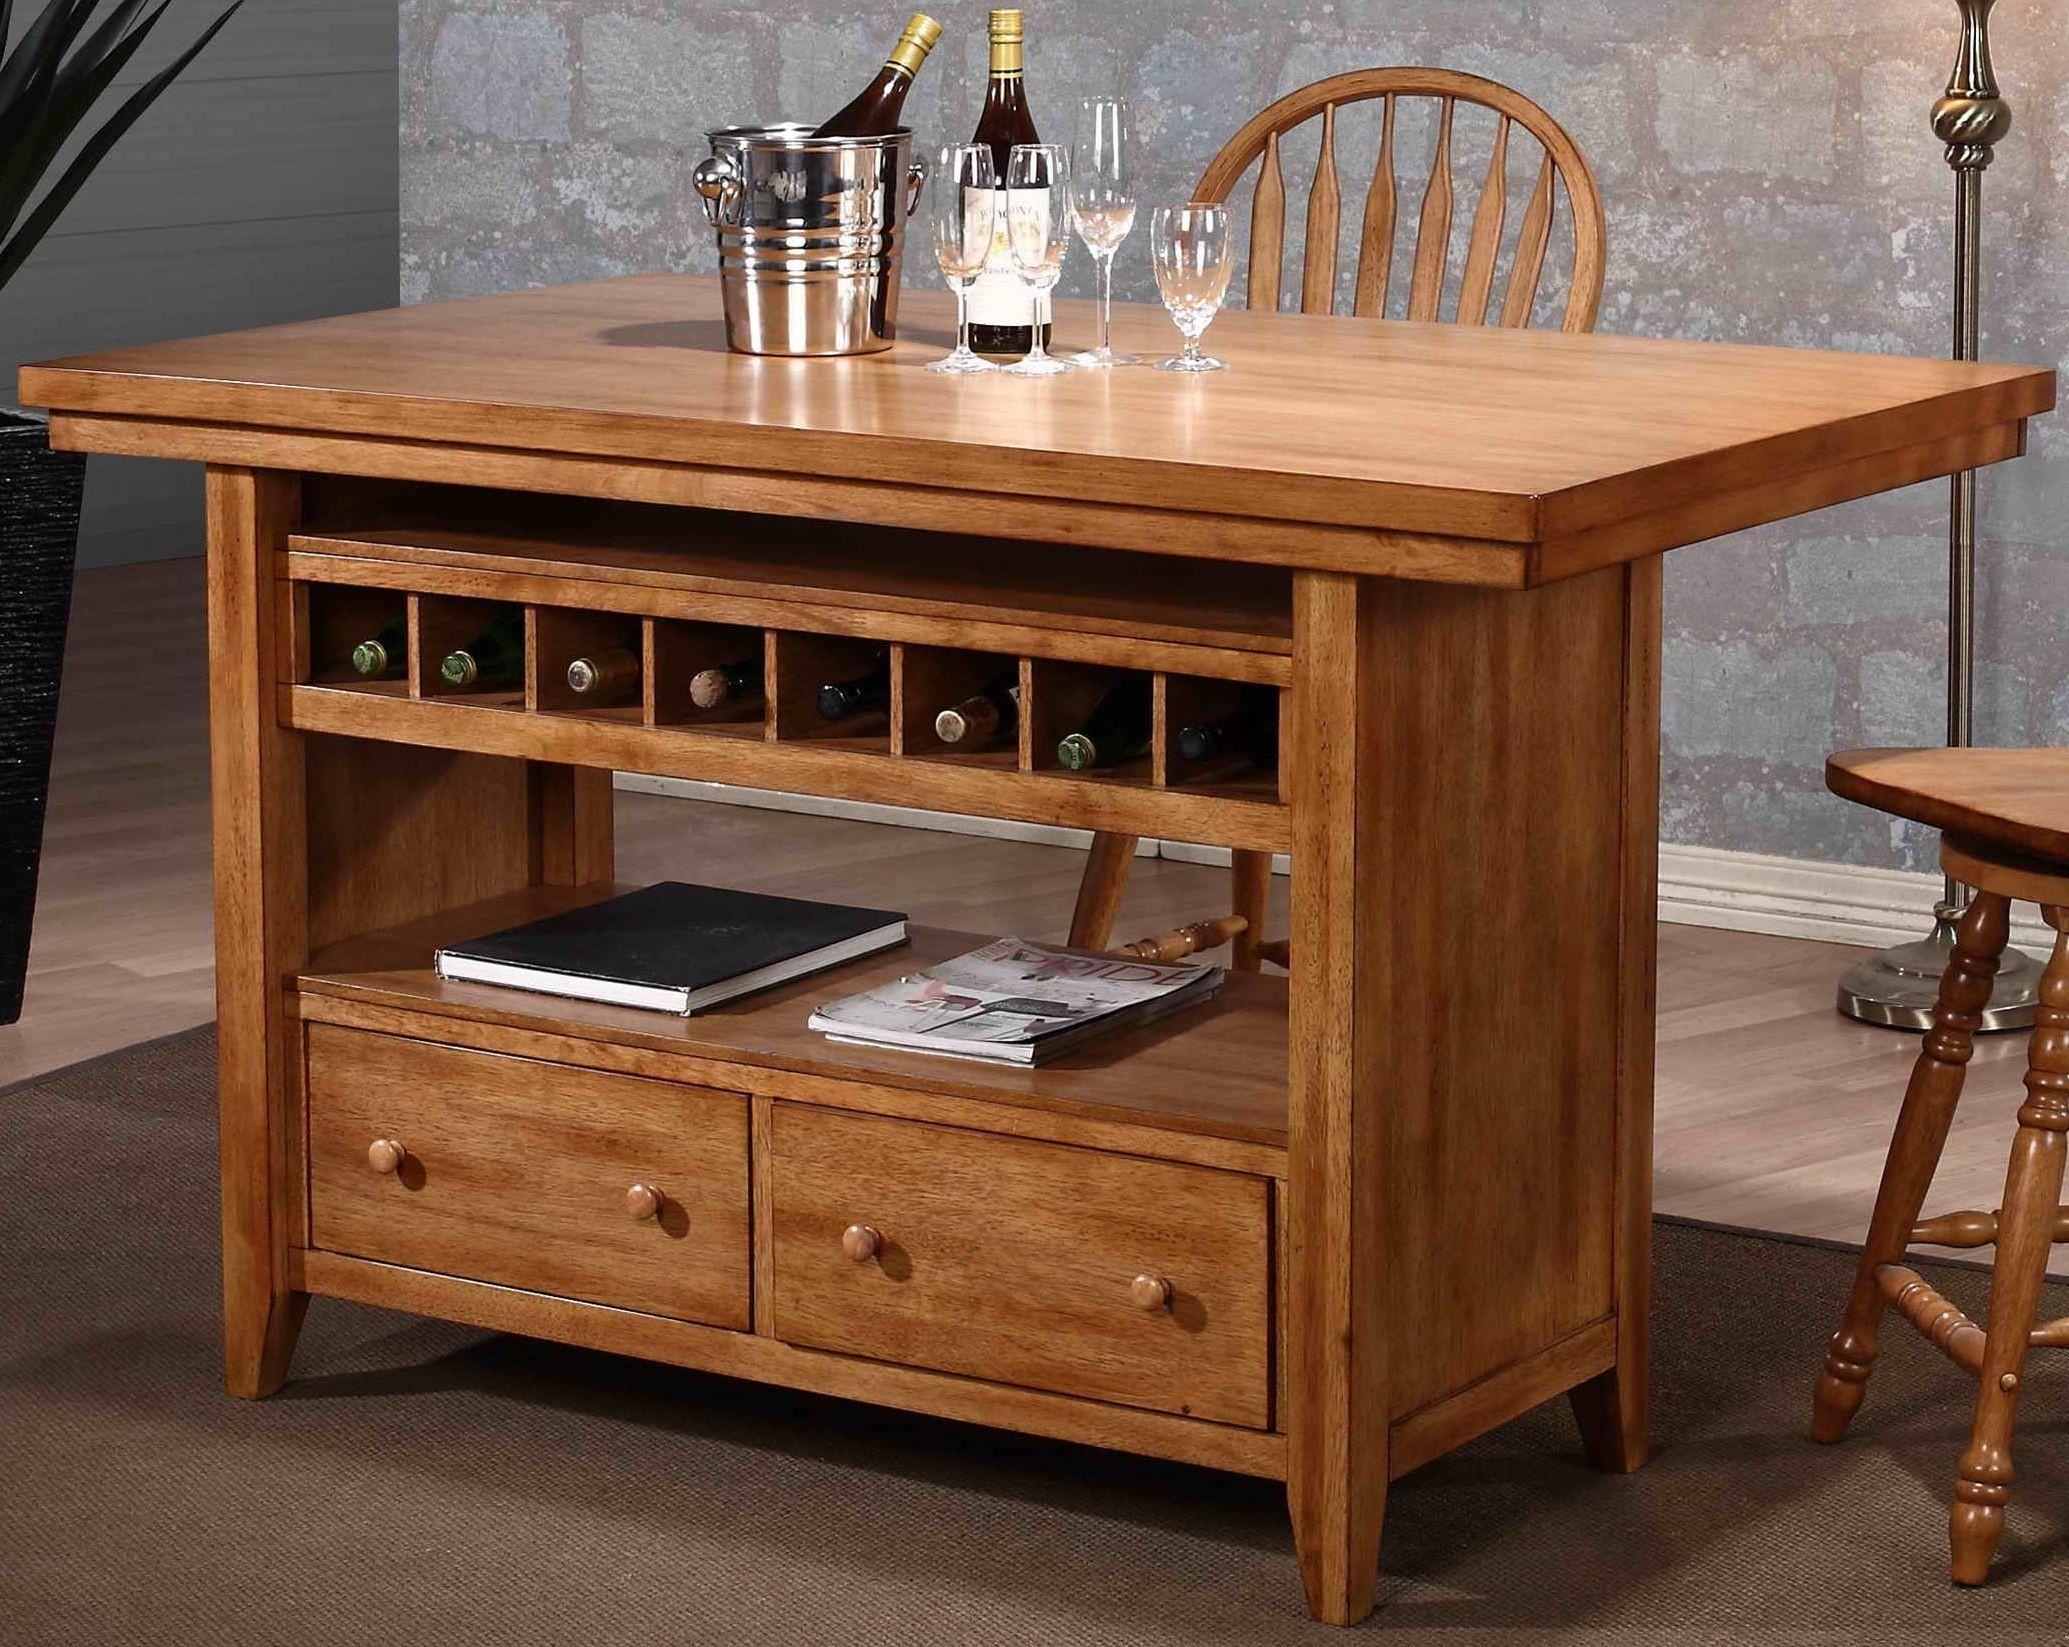 Four Seasons Rustic Oak Kitchen Island from ECI Furniture ...